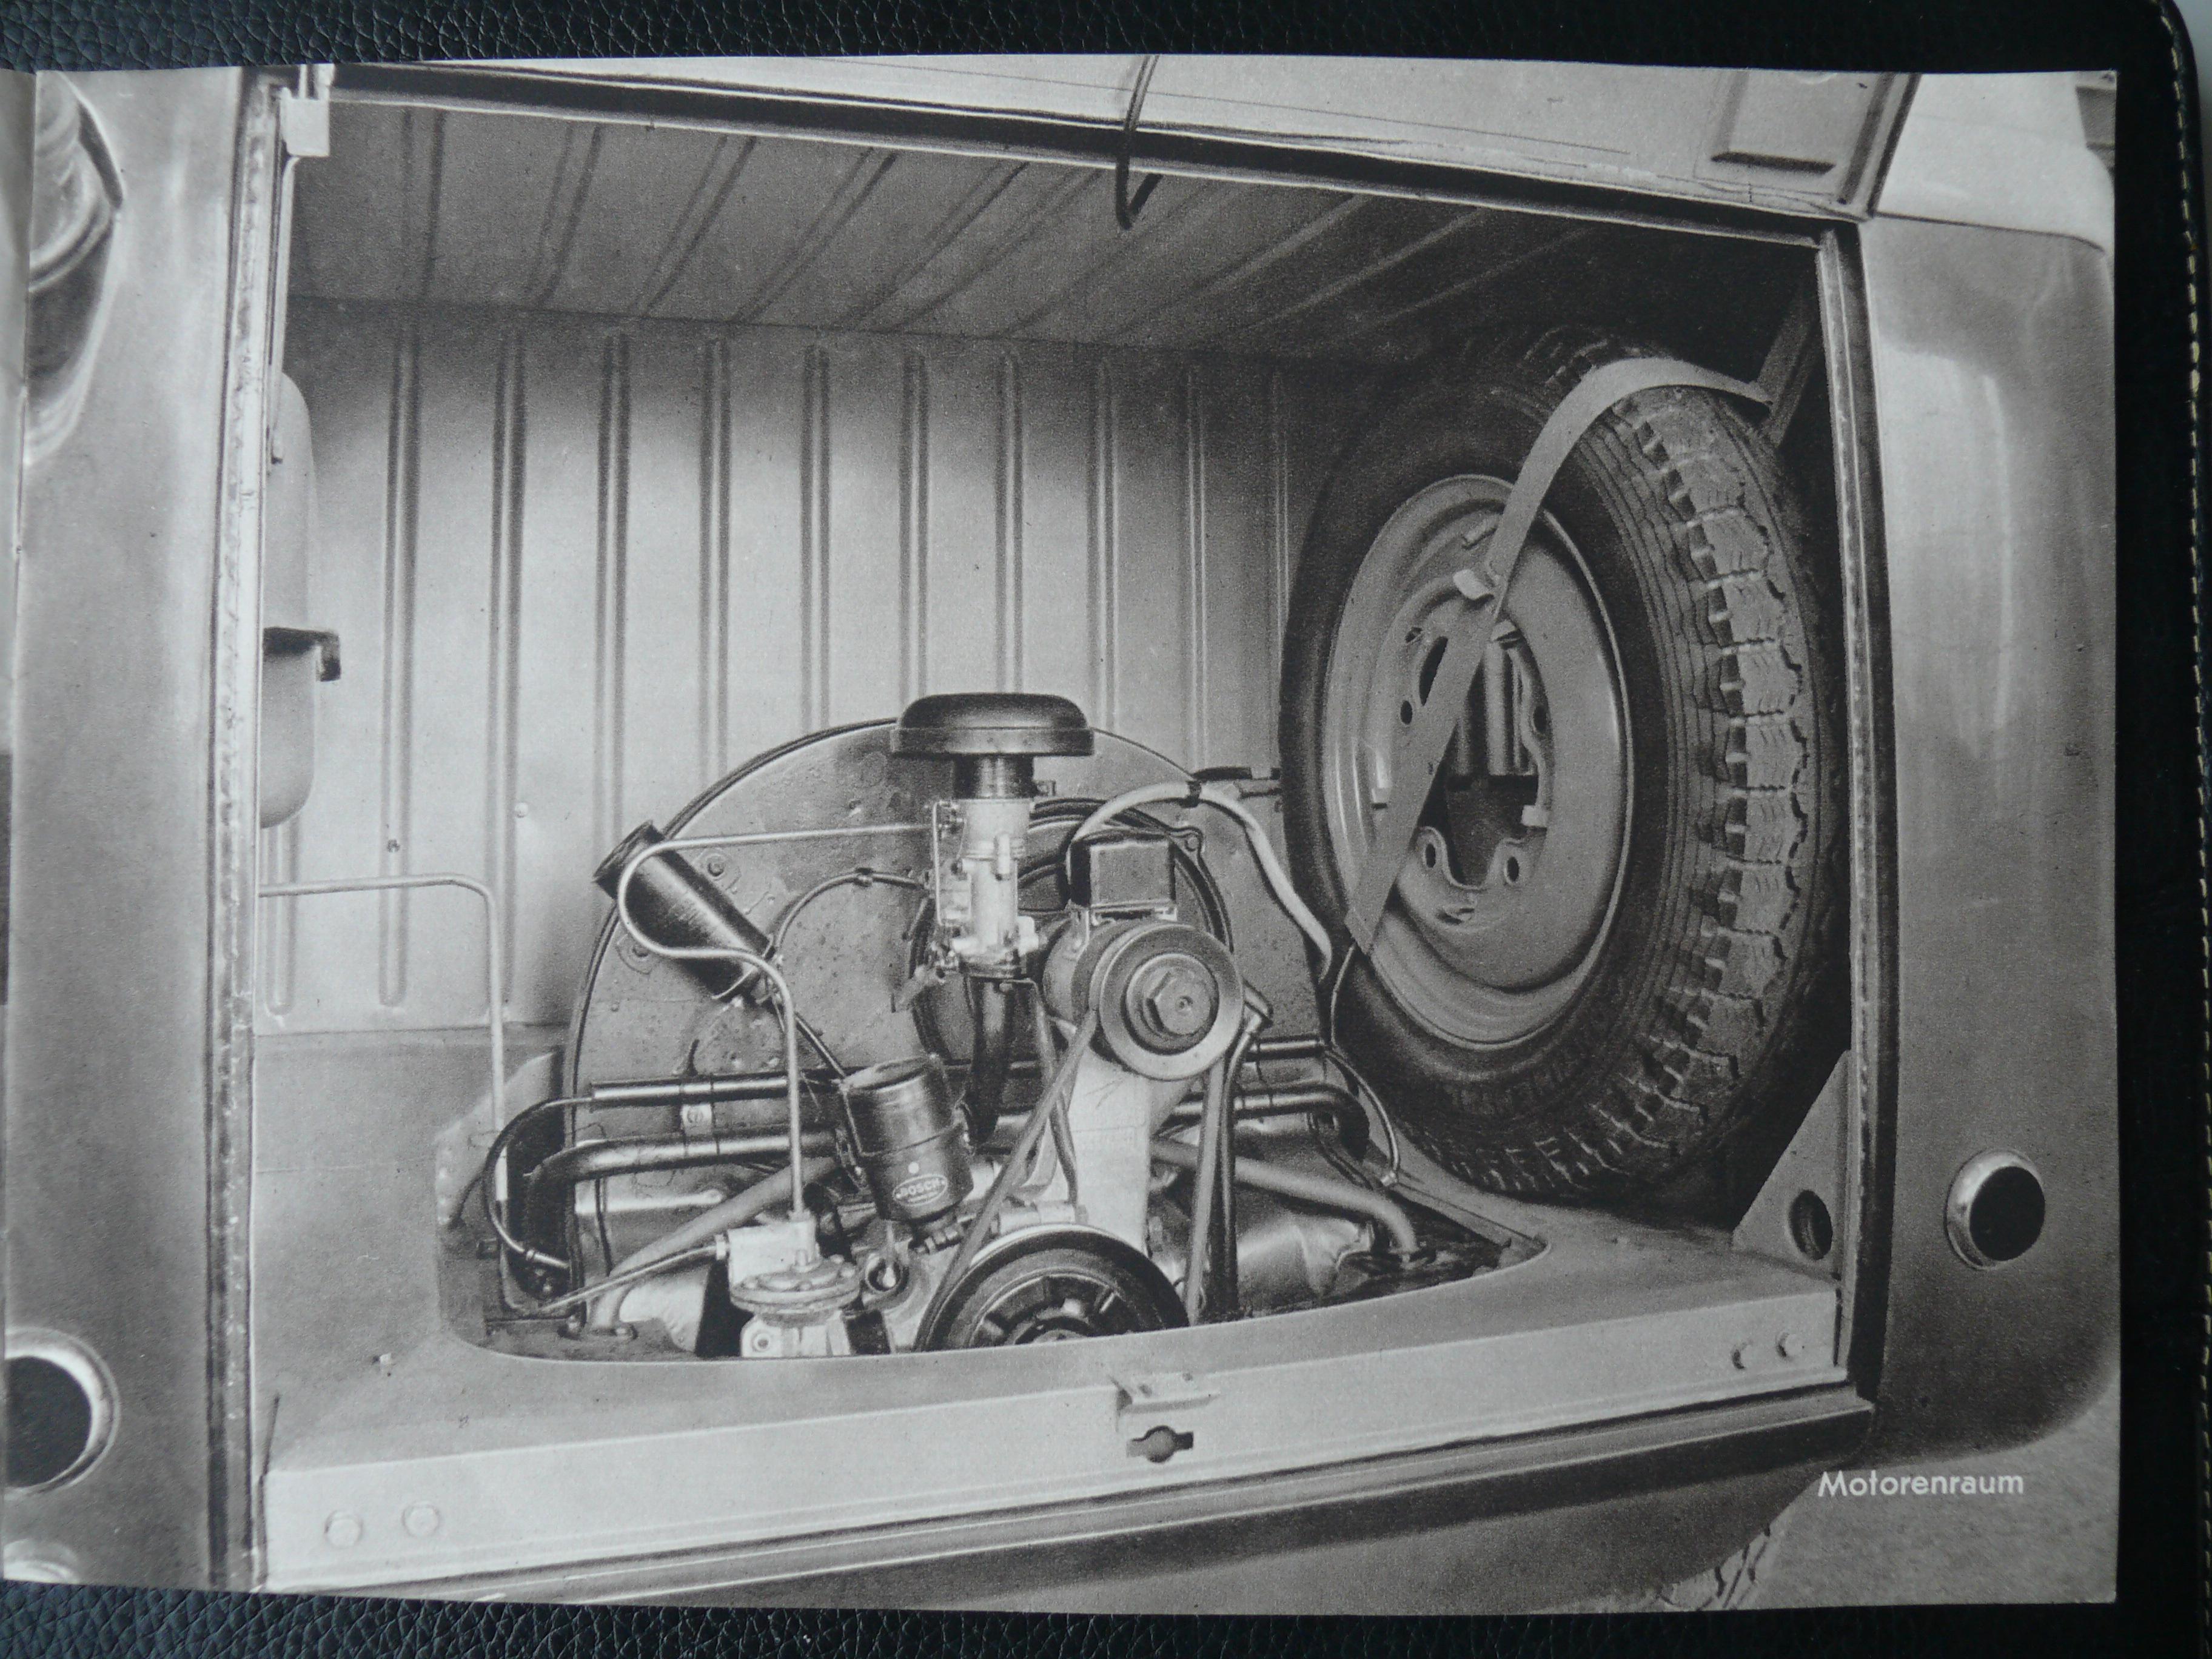 Thesamba Com Vw Archives 1950 Bus Vw Lieferwagen